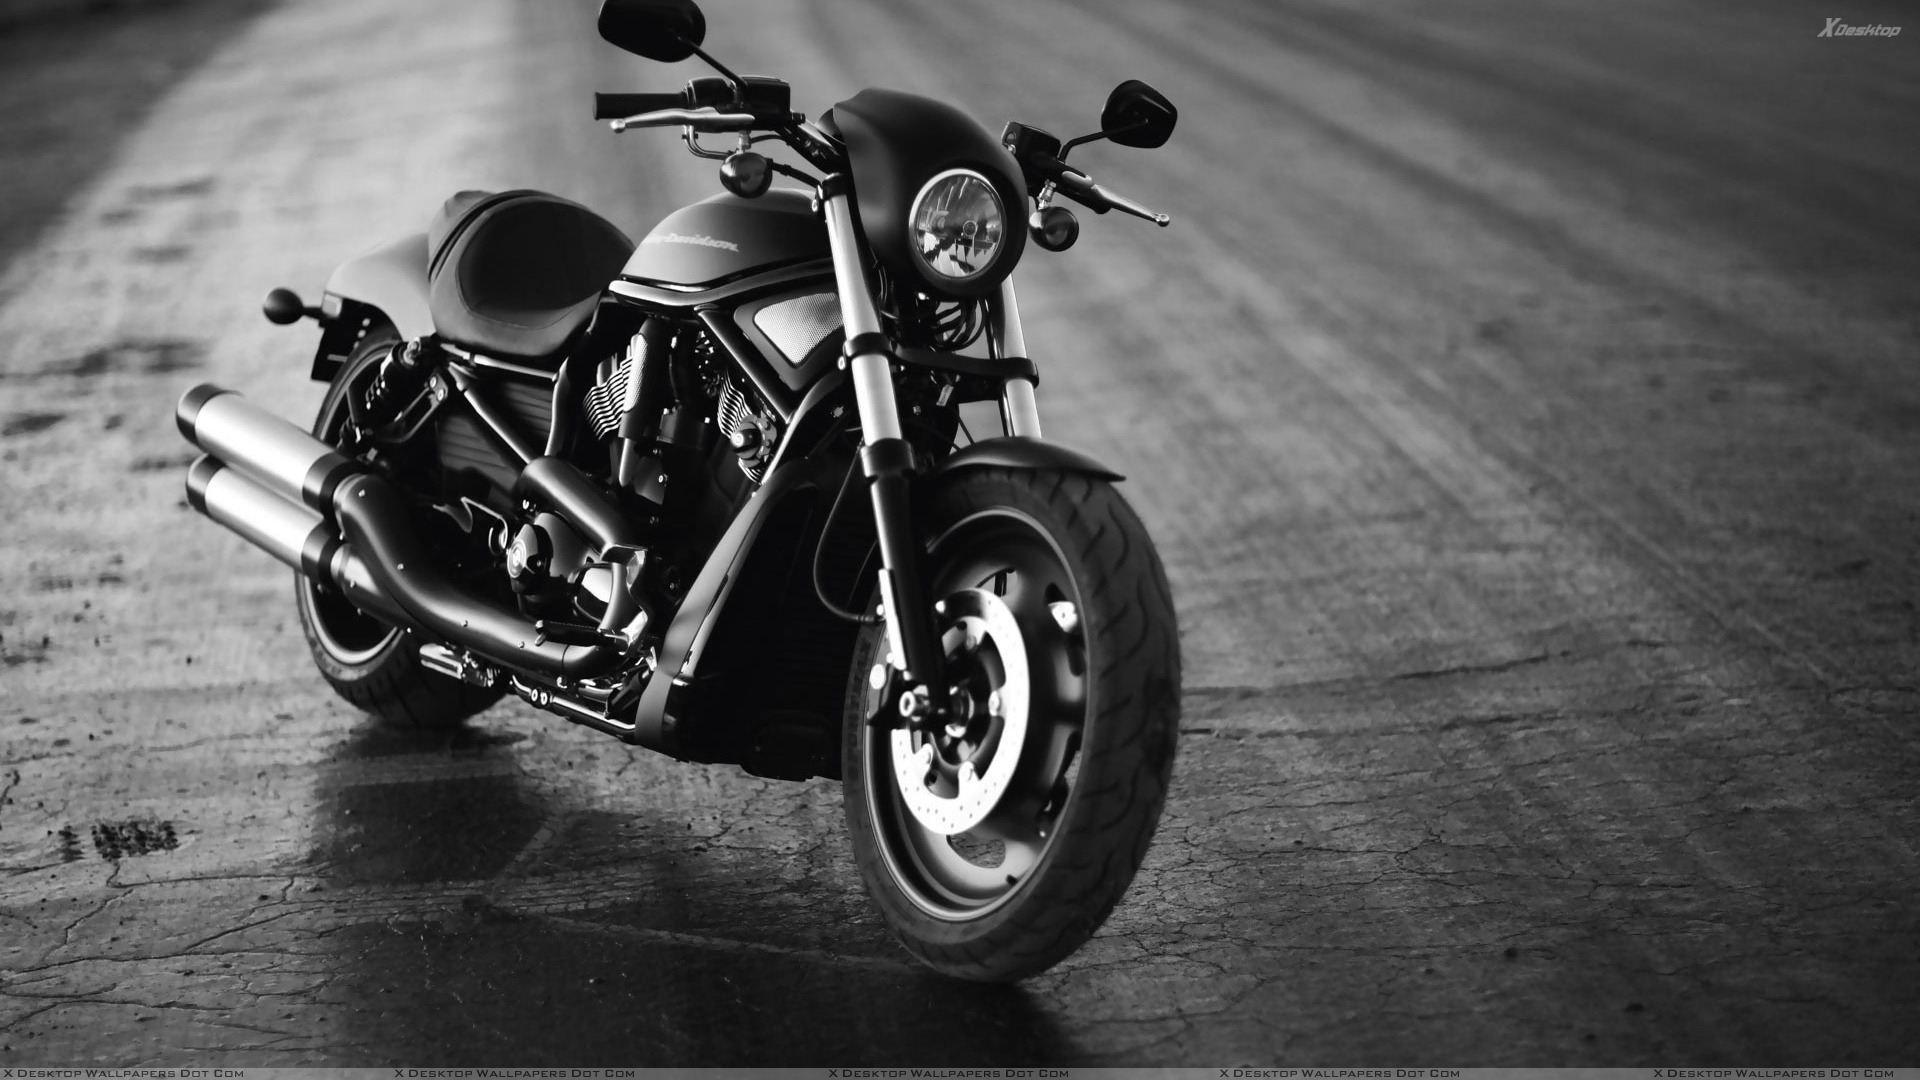 Harley davidson bike wallpaper gallery